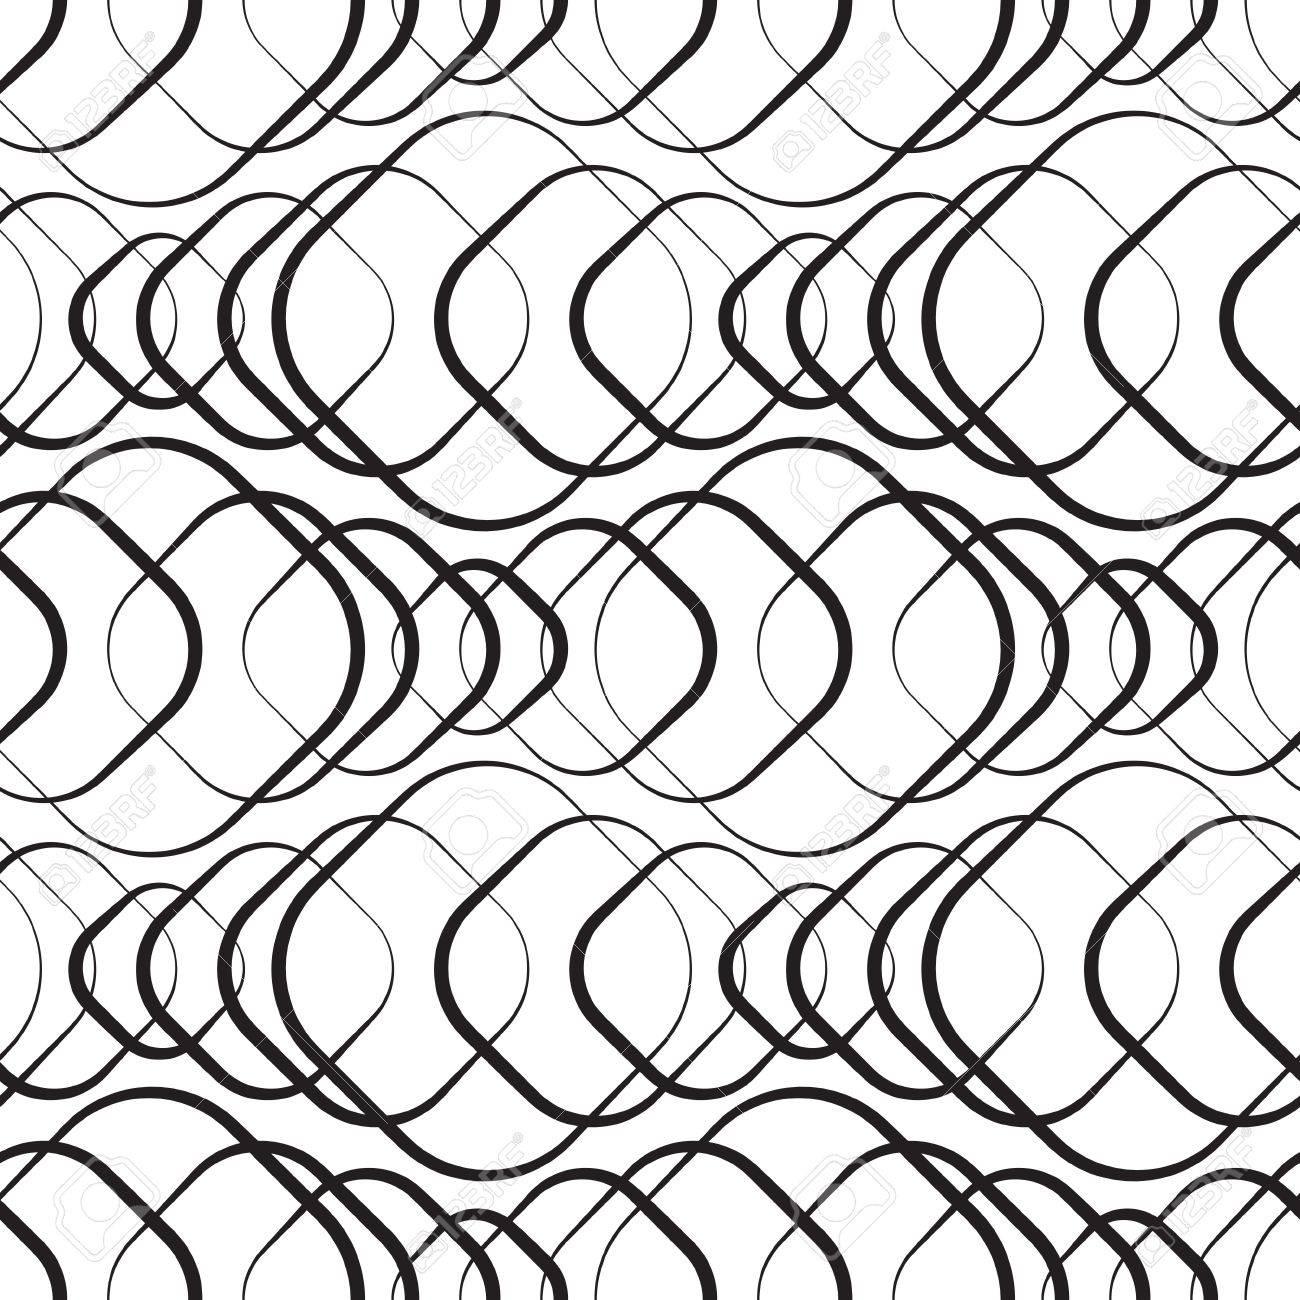 Seamless Monochrome Geometric Wallpaper Stock Vector - 21929408